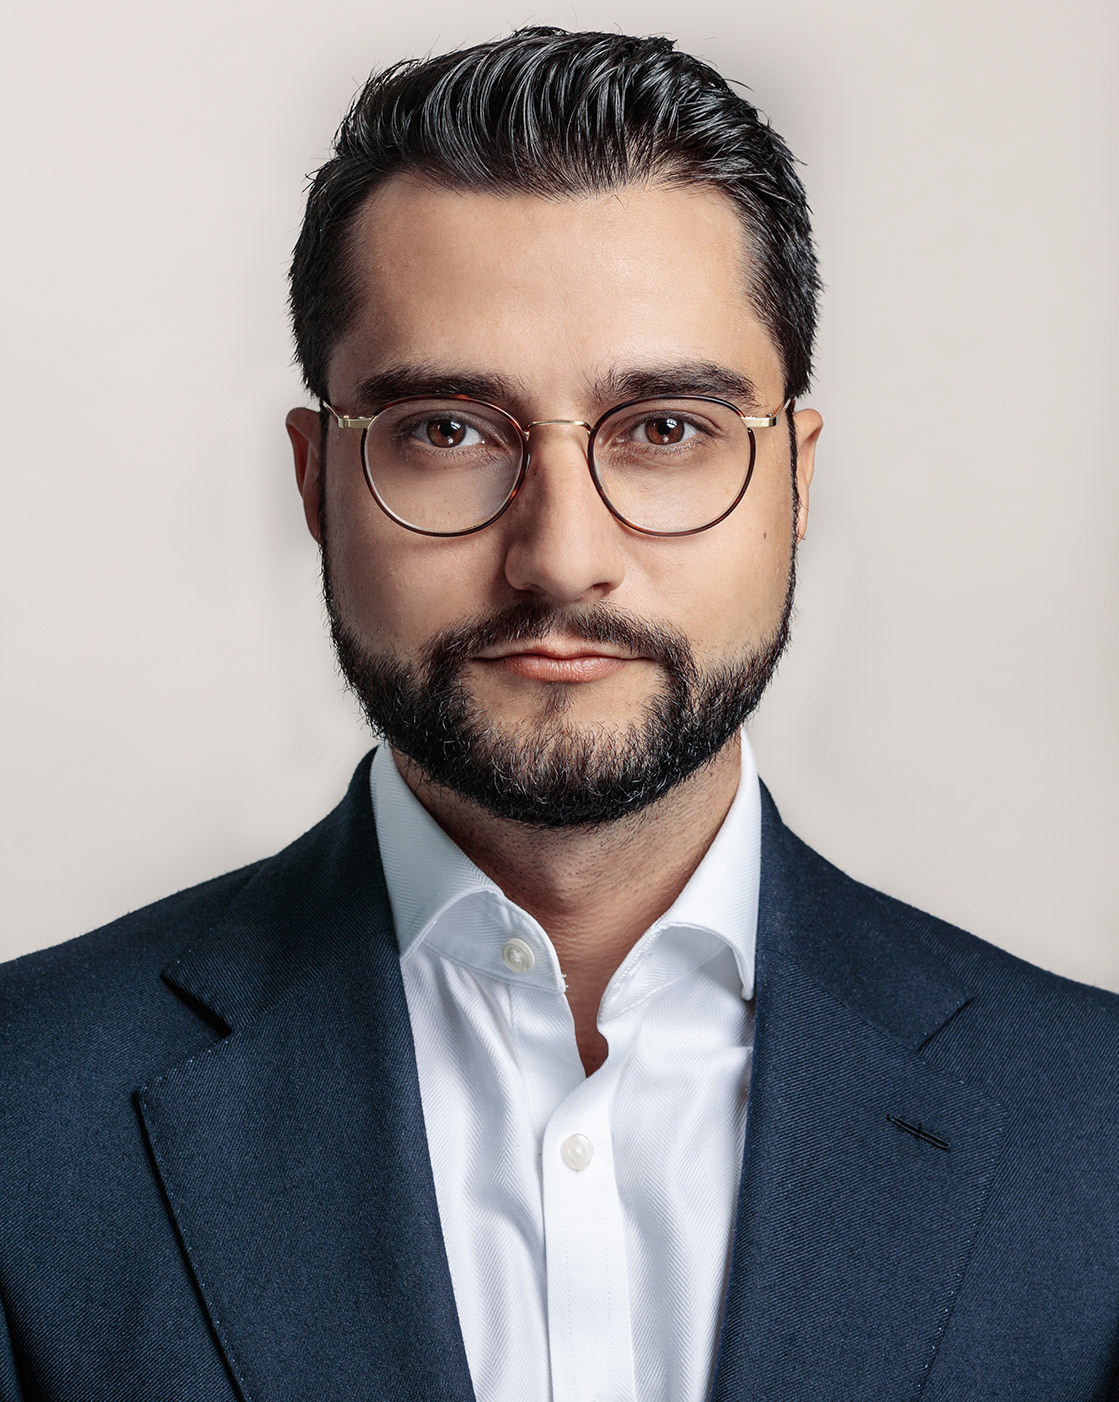 Kurosch D. Habibi